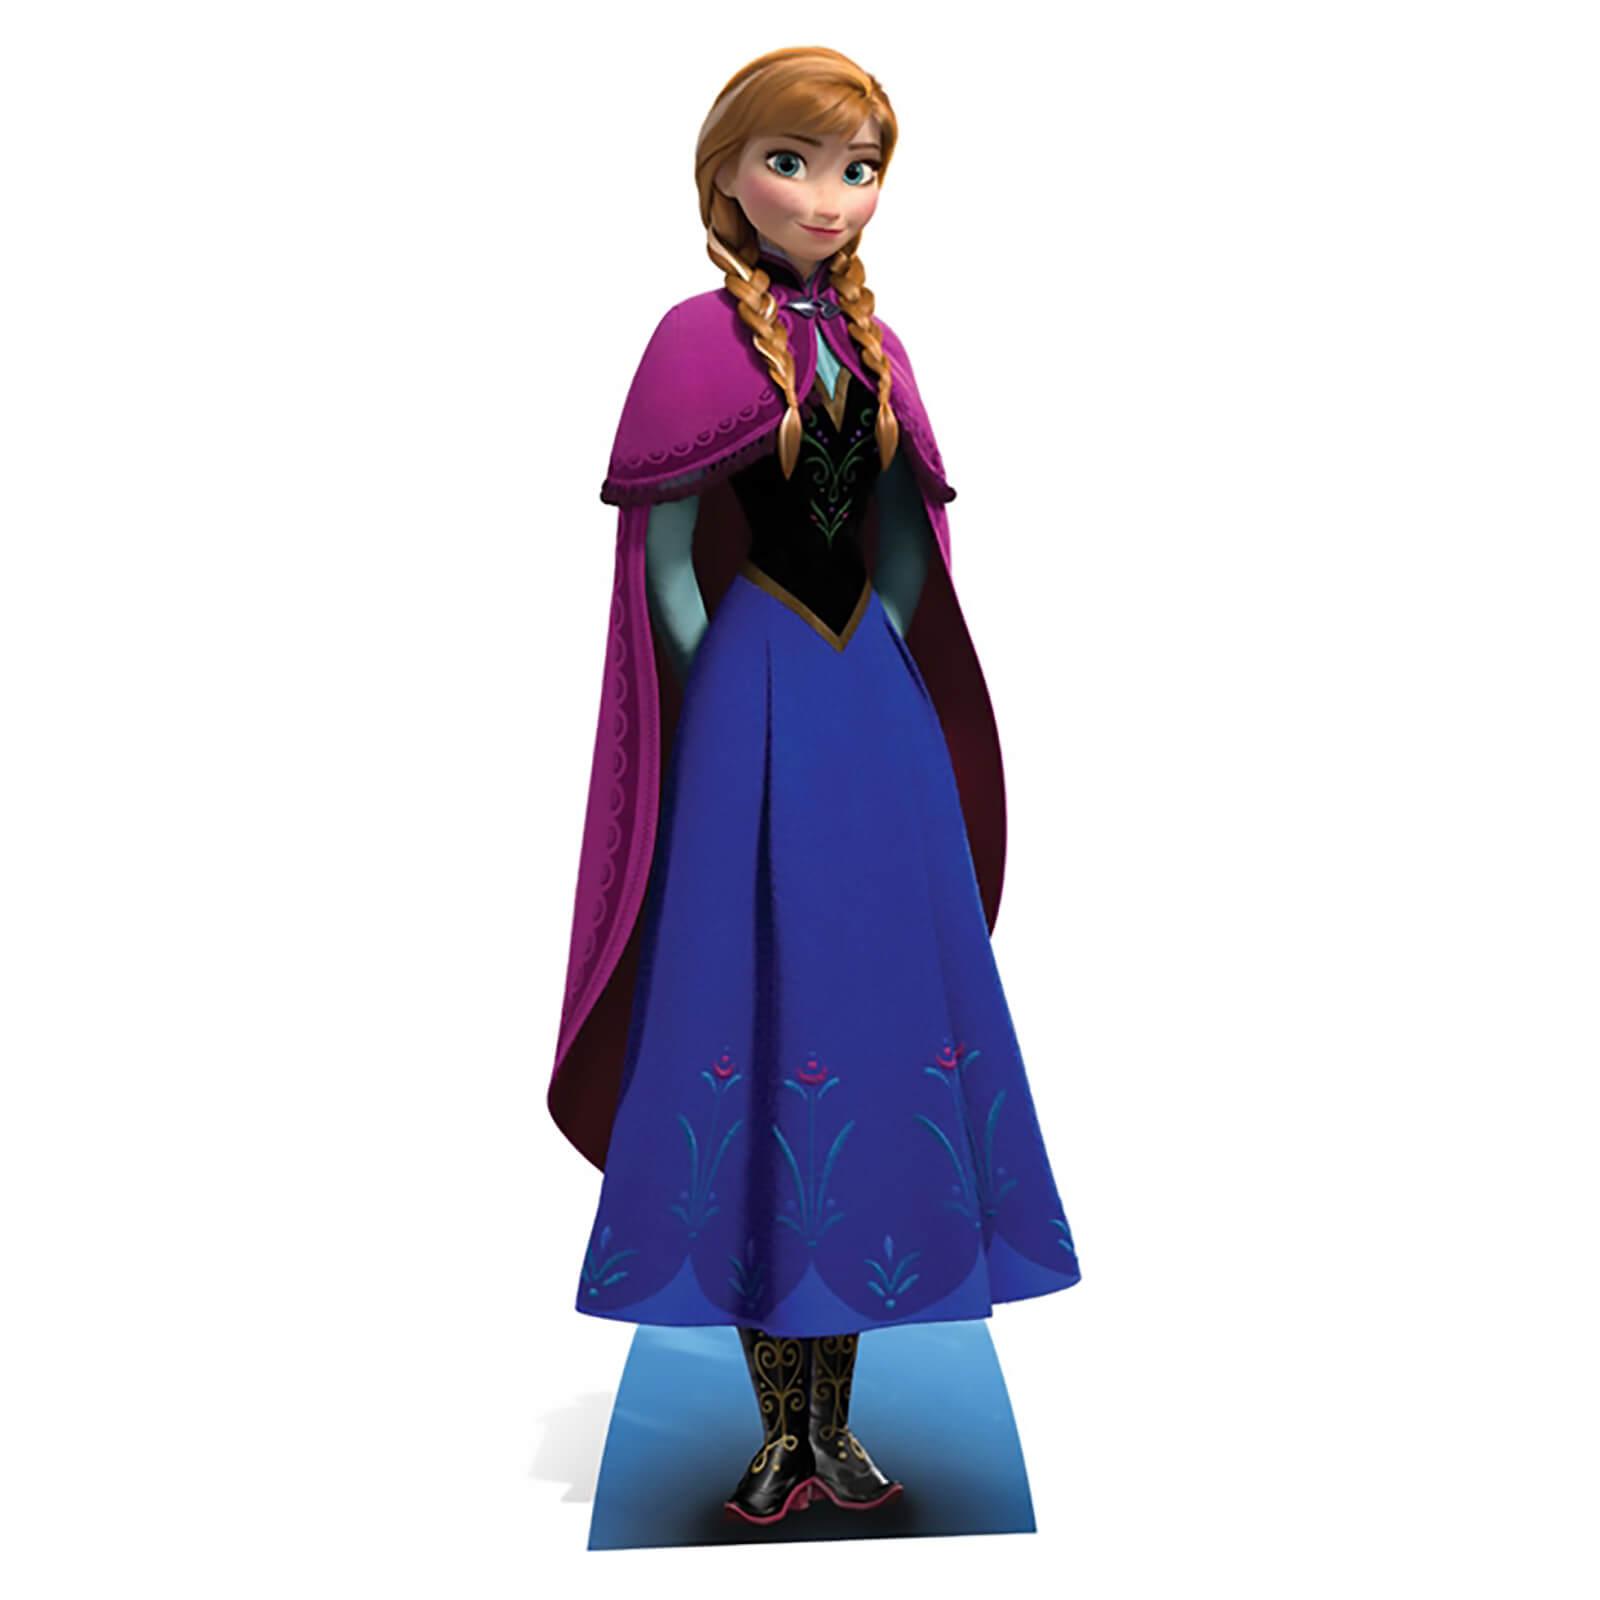 Image of Disney Frozen Anna Mini Cardboard Cut Out